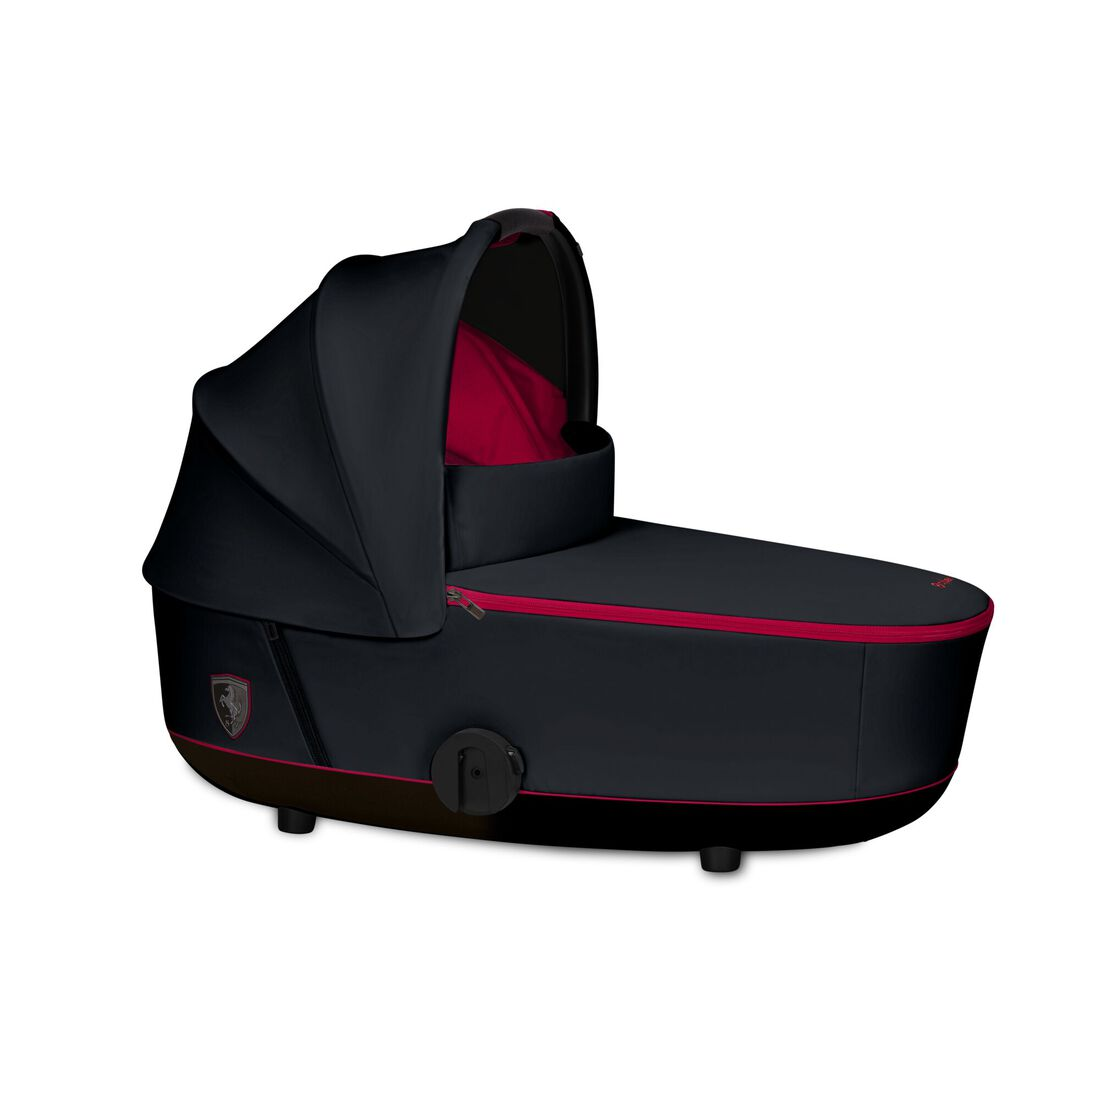 CYBEX Mios Lux Carry Cot - Ferrari Victory Black in Ferrari Victory Black large Bild 1